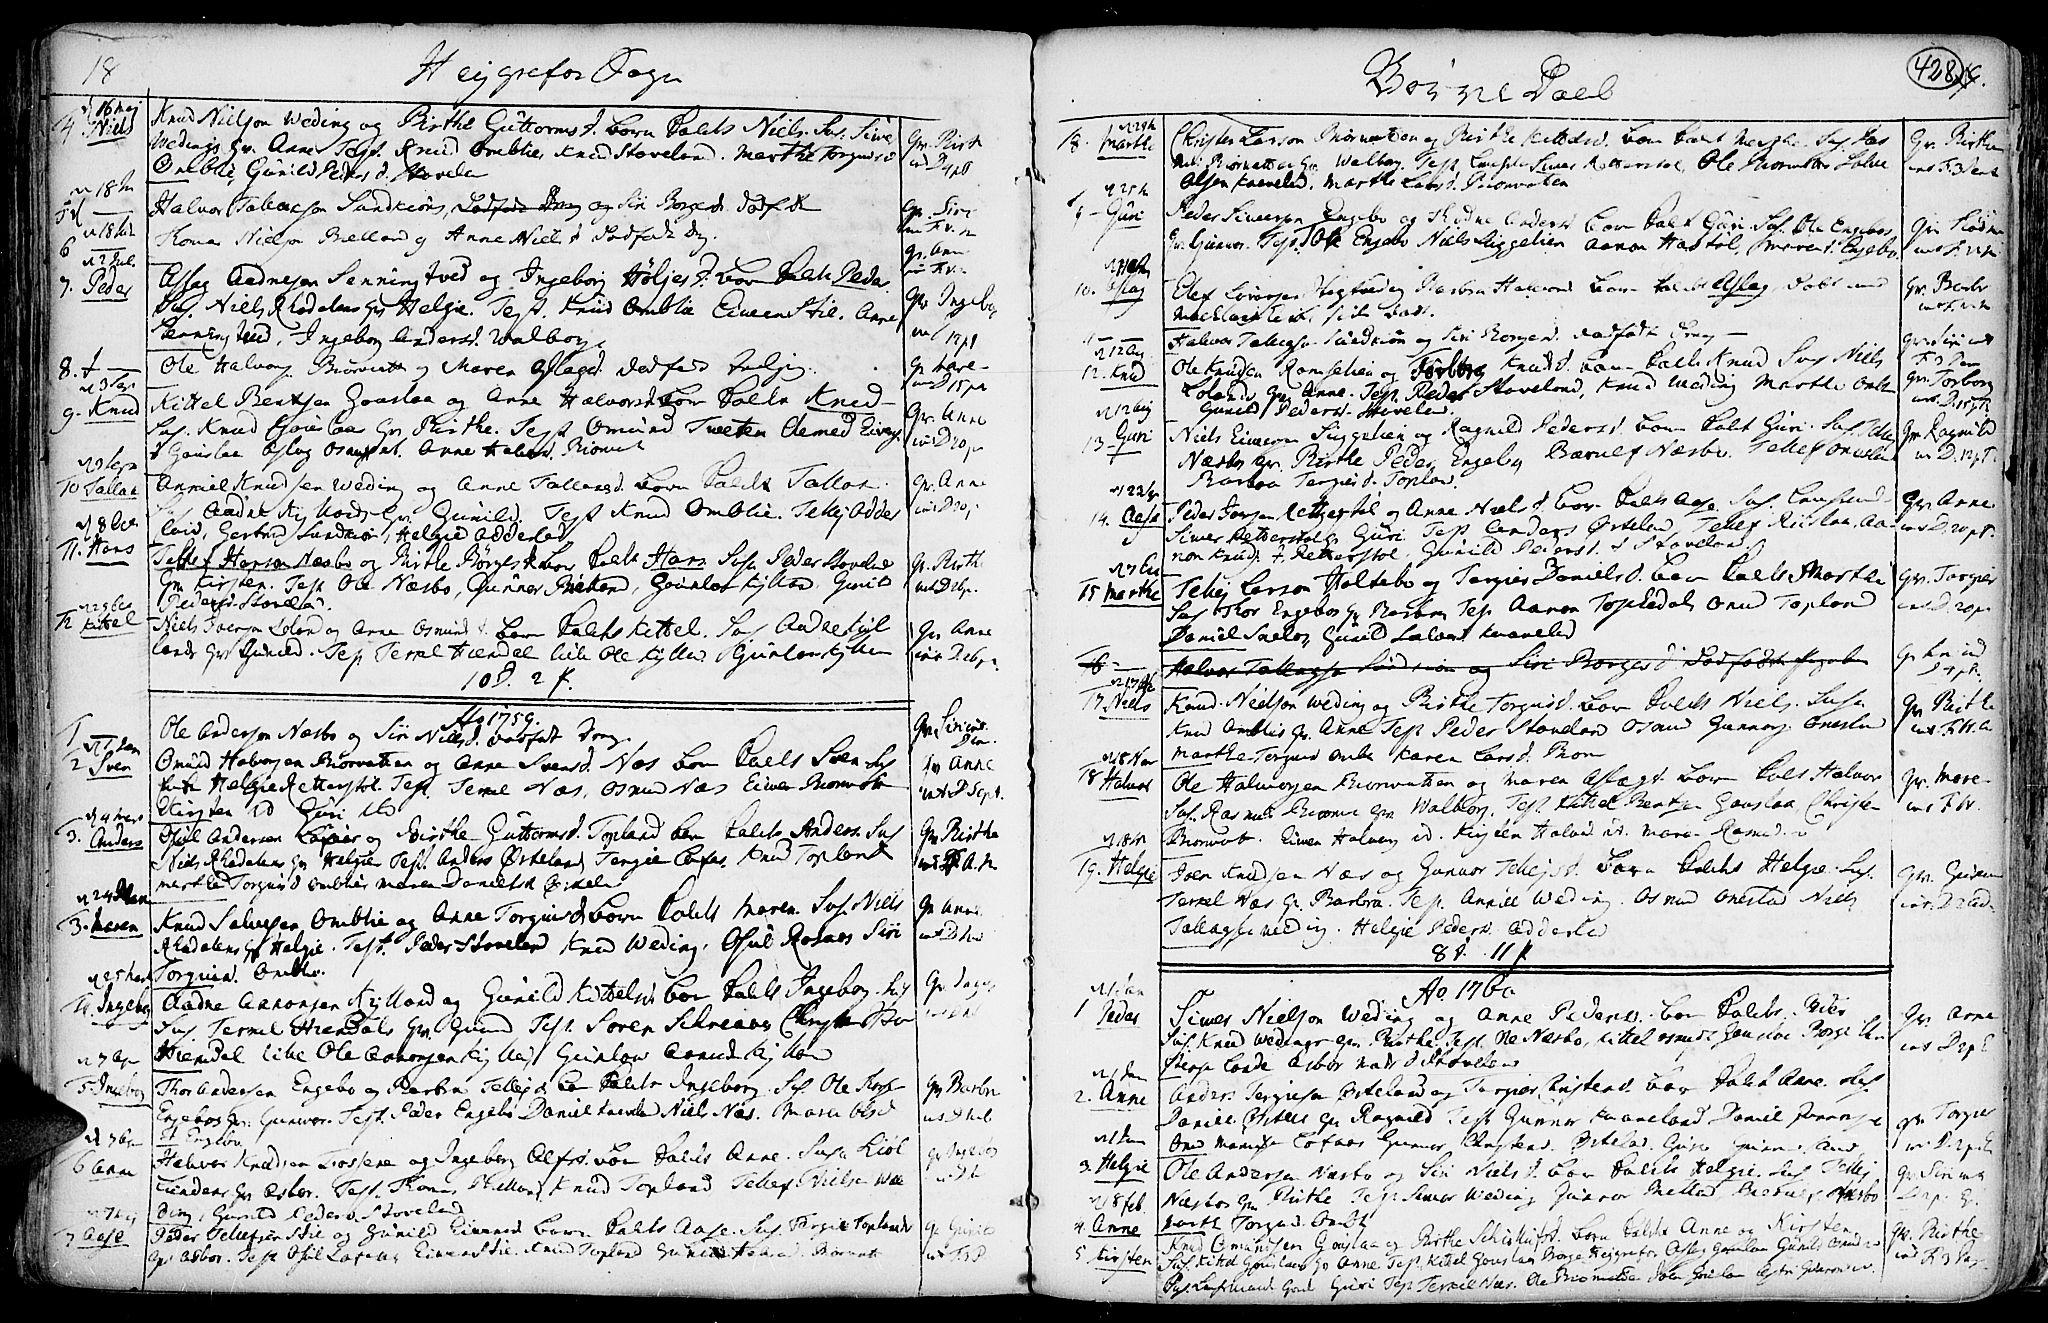 SAK, Hommedal sokneprestkontor, F/Fa/Fab/L0002: Ministerialbok nr. A 2 /3, 1740-1821, s. 428